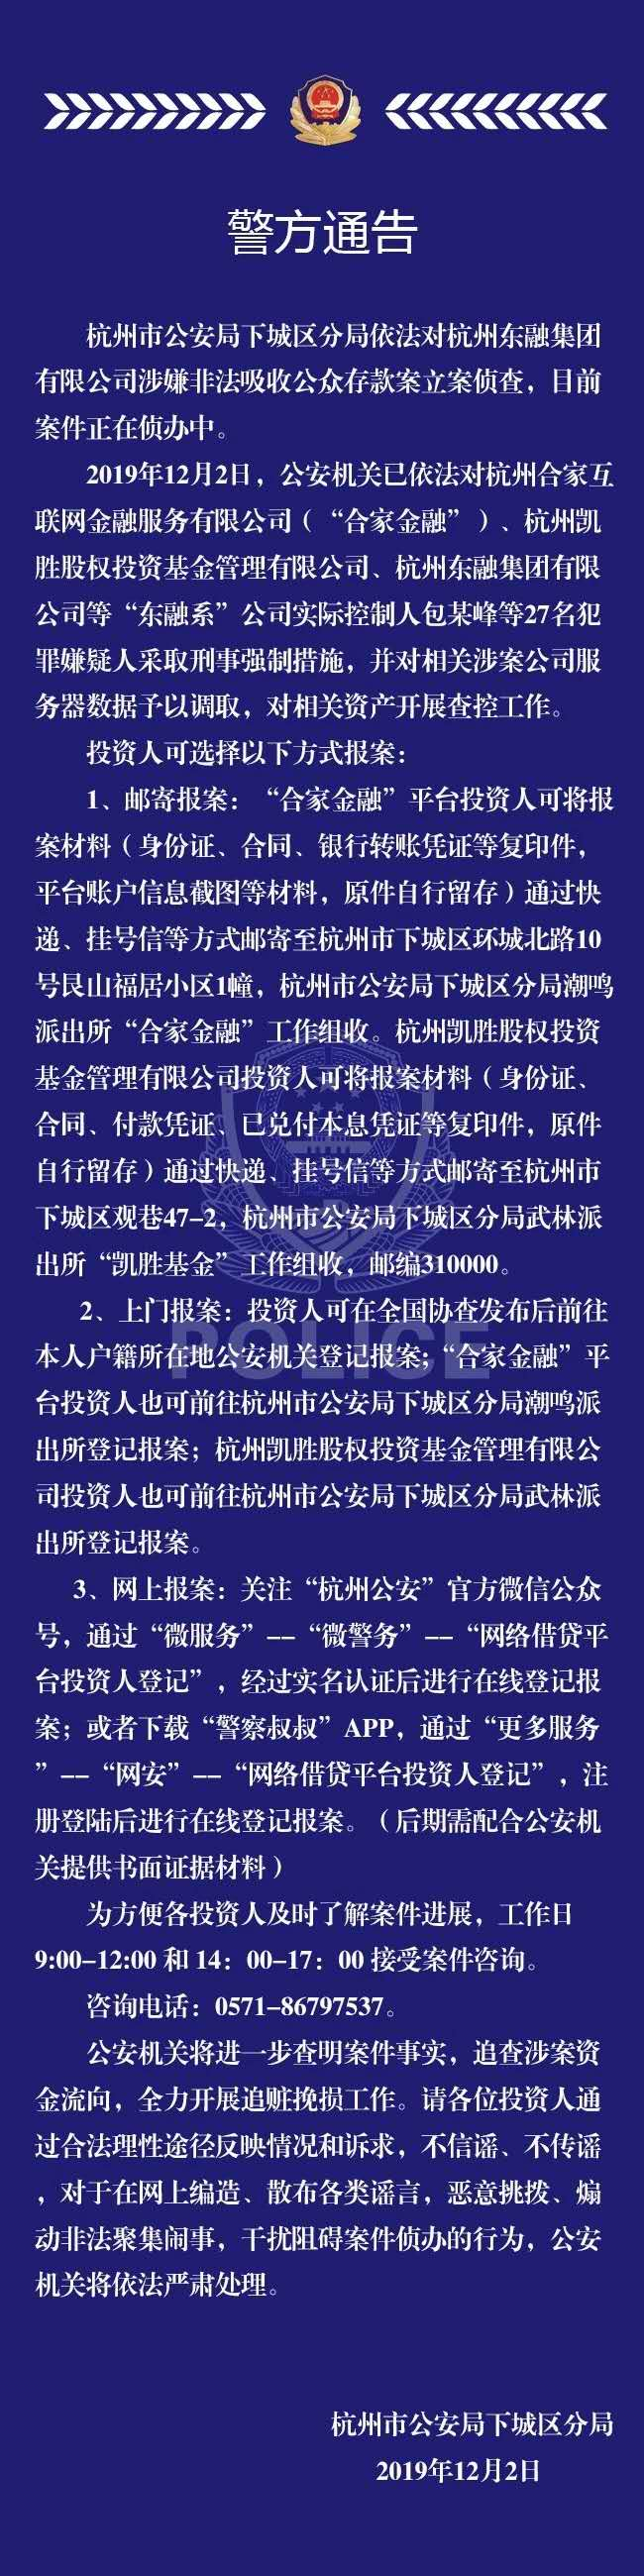 http://www.axxxc.com/kejishuma/1144226.html